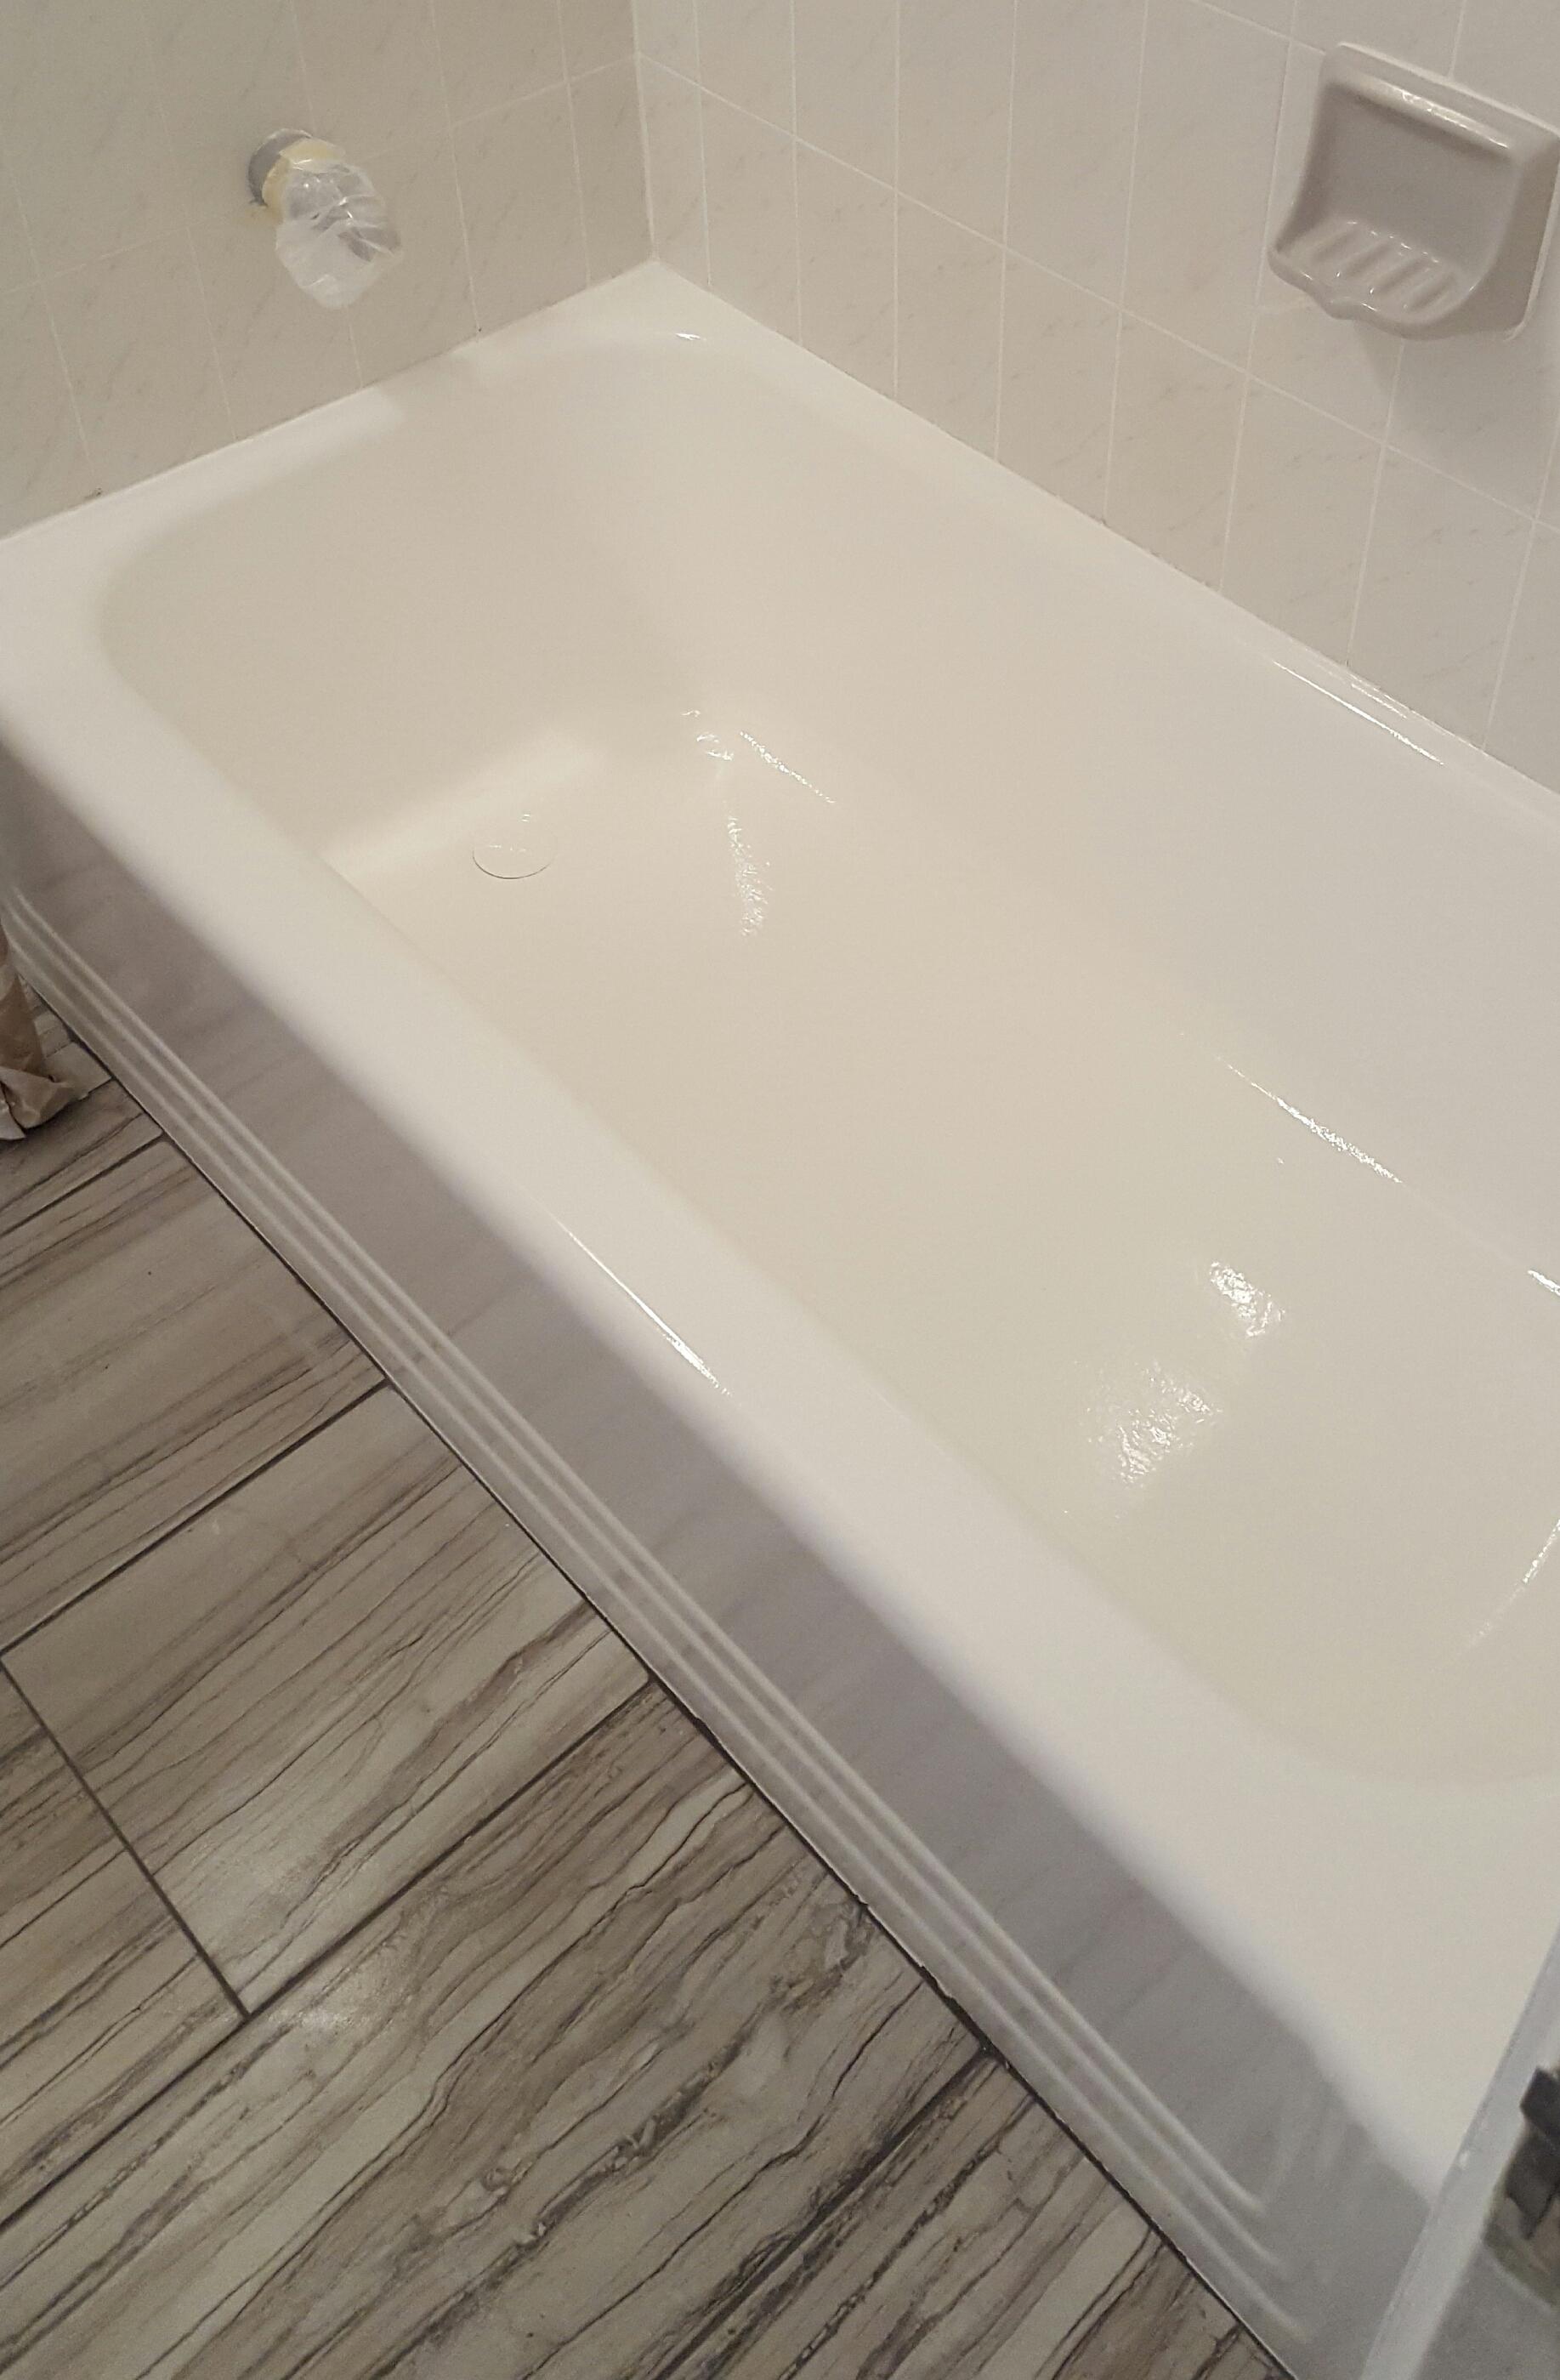 http://www.bathtubdoctor.com/wp-content/uploads/2017/03/20170223_215812.jpg